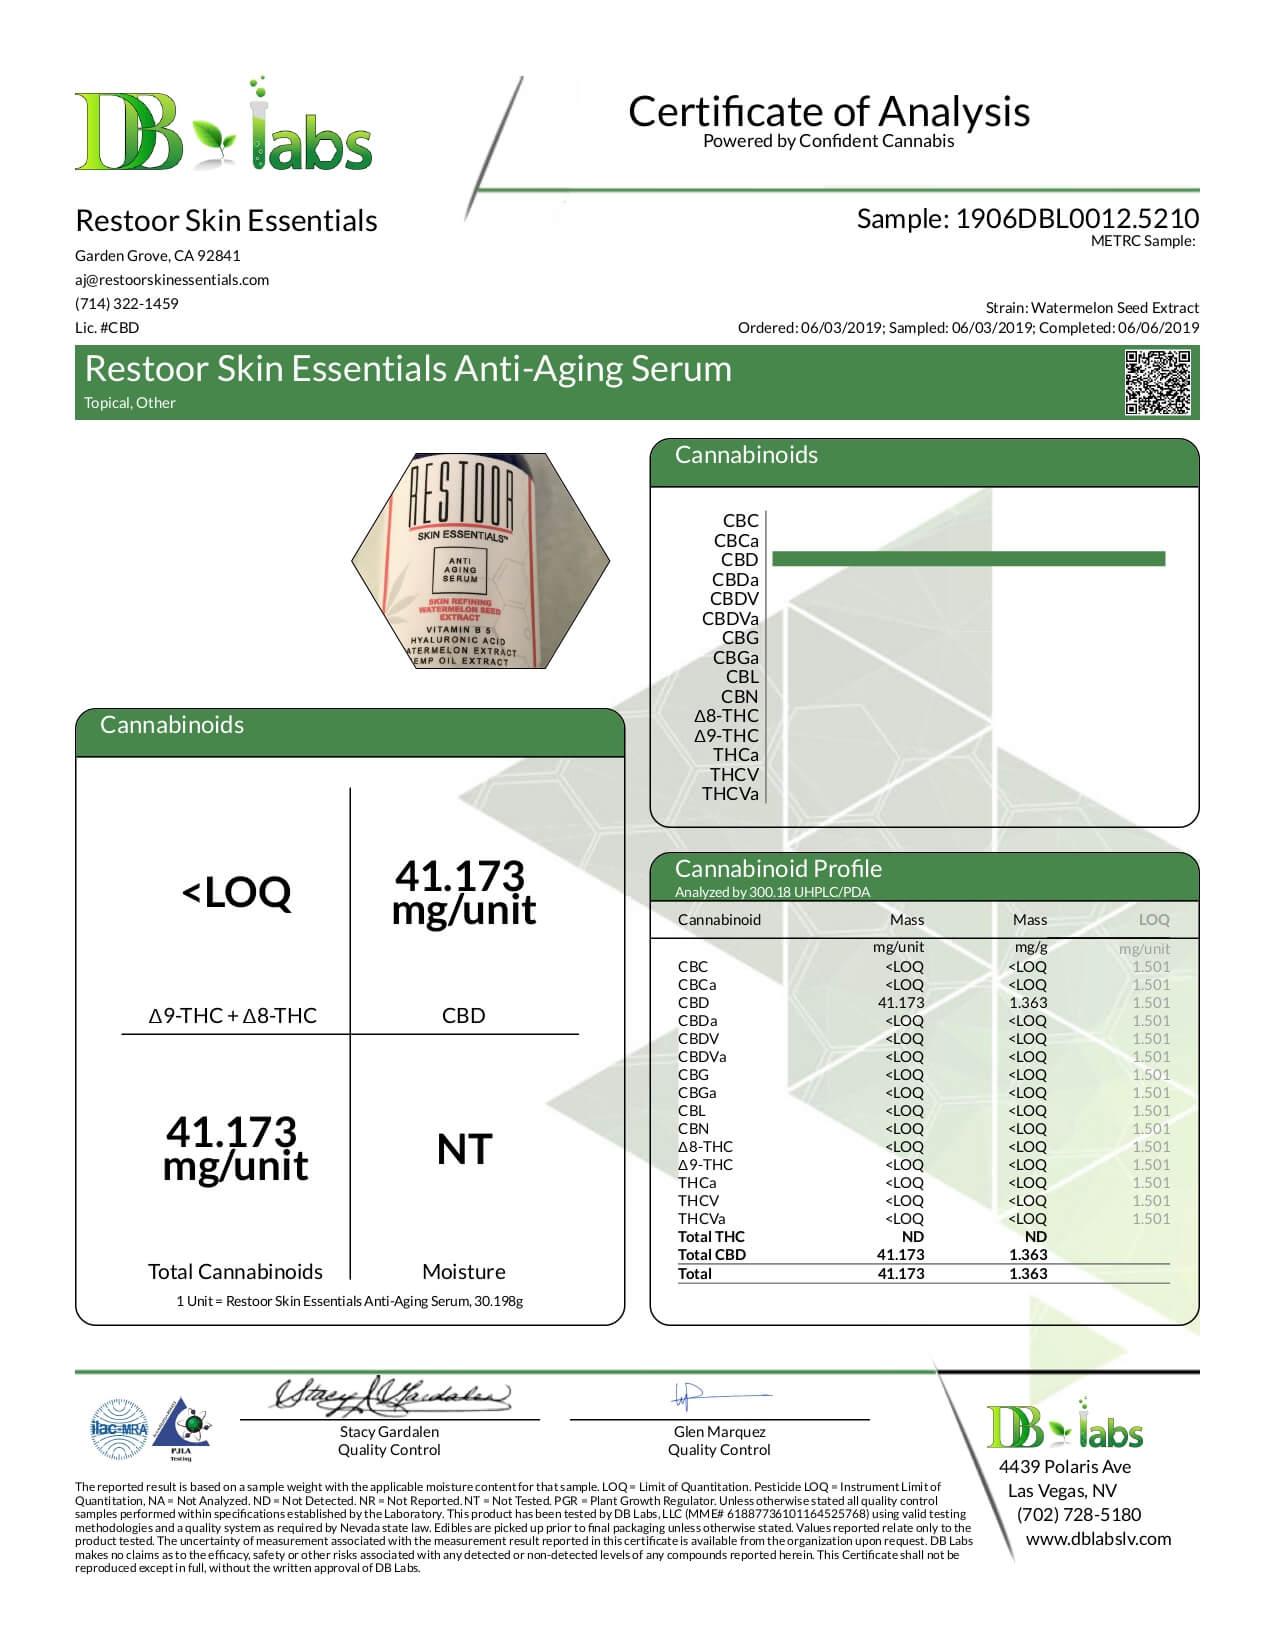 Restoor Skin Essentials Skin Refining Watermelon Seed Extract Serum Lab Report